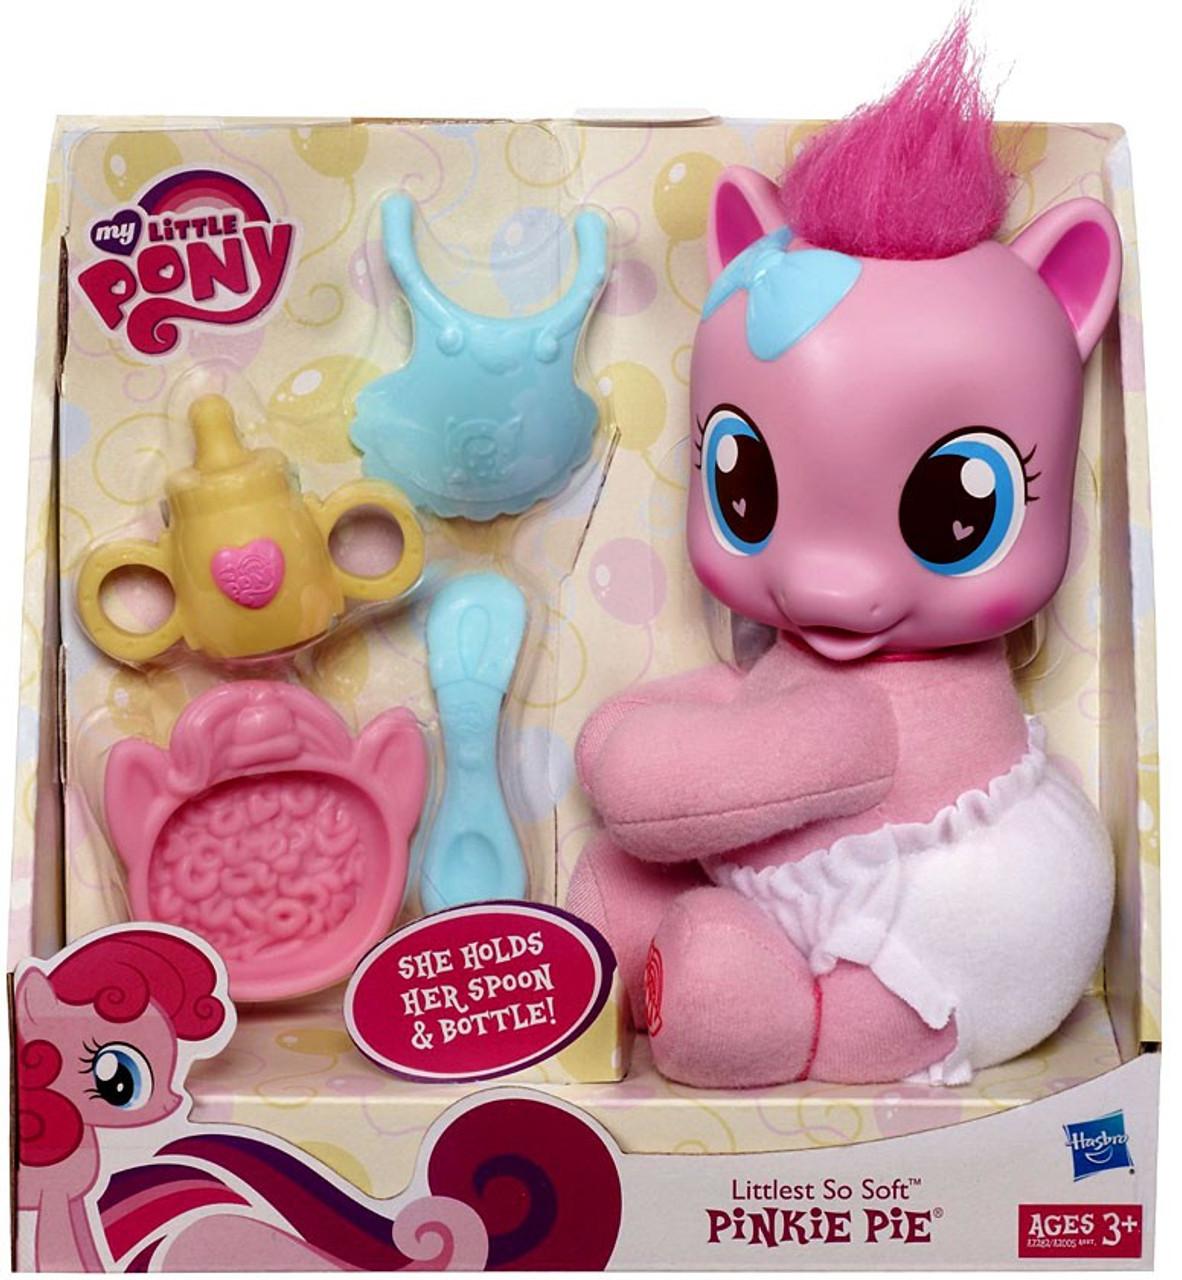 My Little Pony Littlest So Soft Pinkie Pie Doll